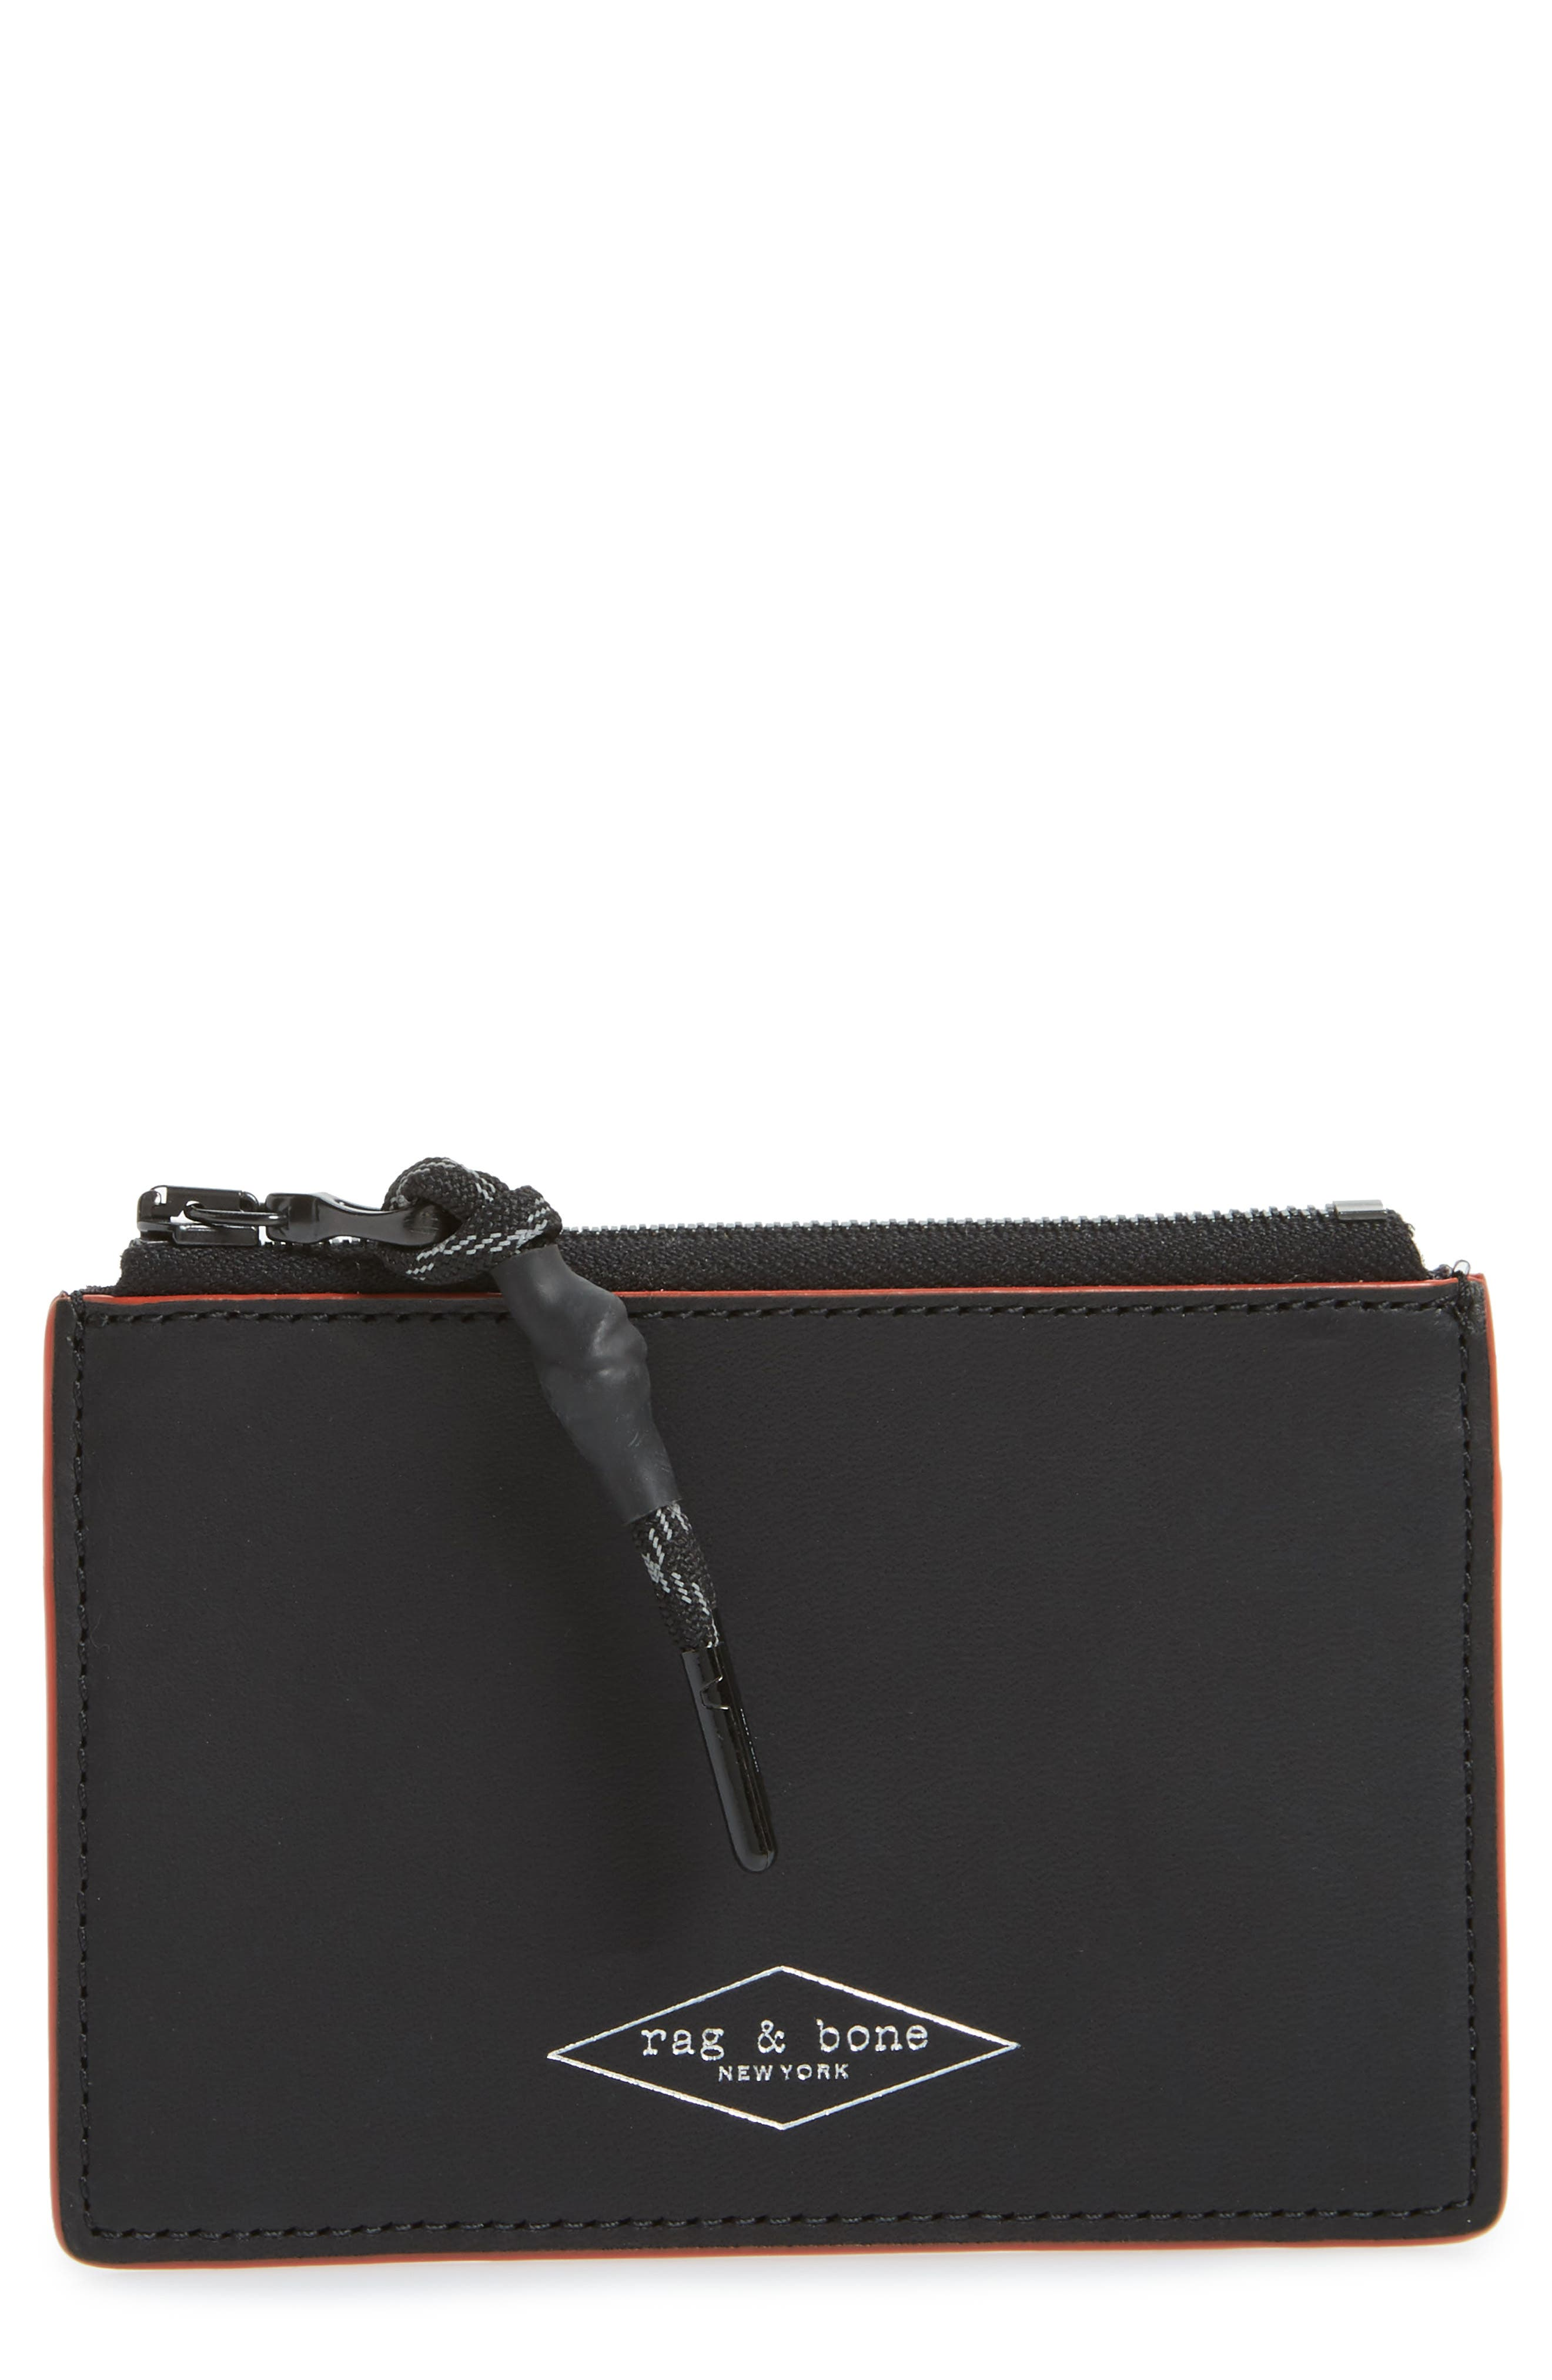 RAG & BONE, Leather Zip Card Case, Main thumbnail 1, color, BLACK COMBO